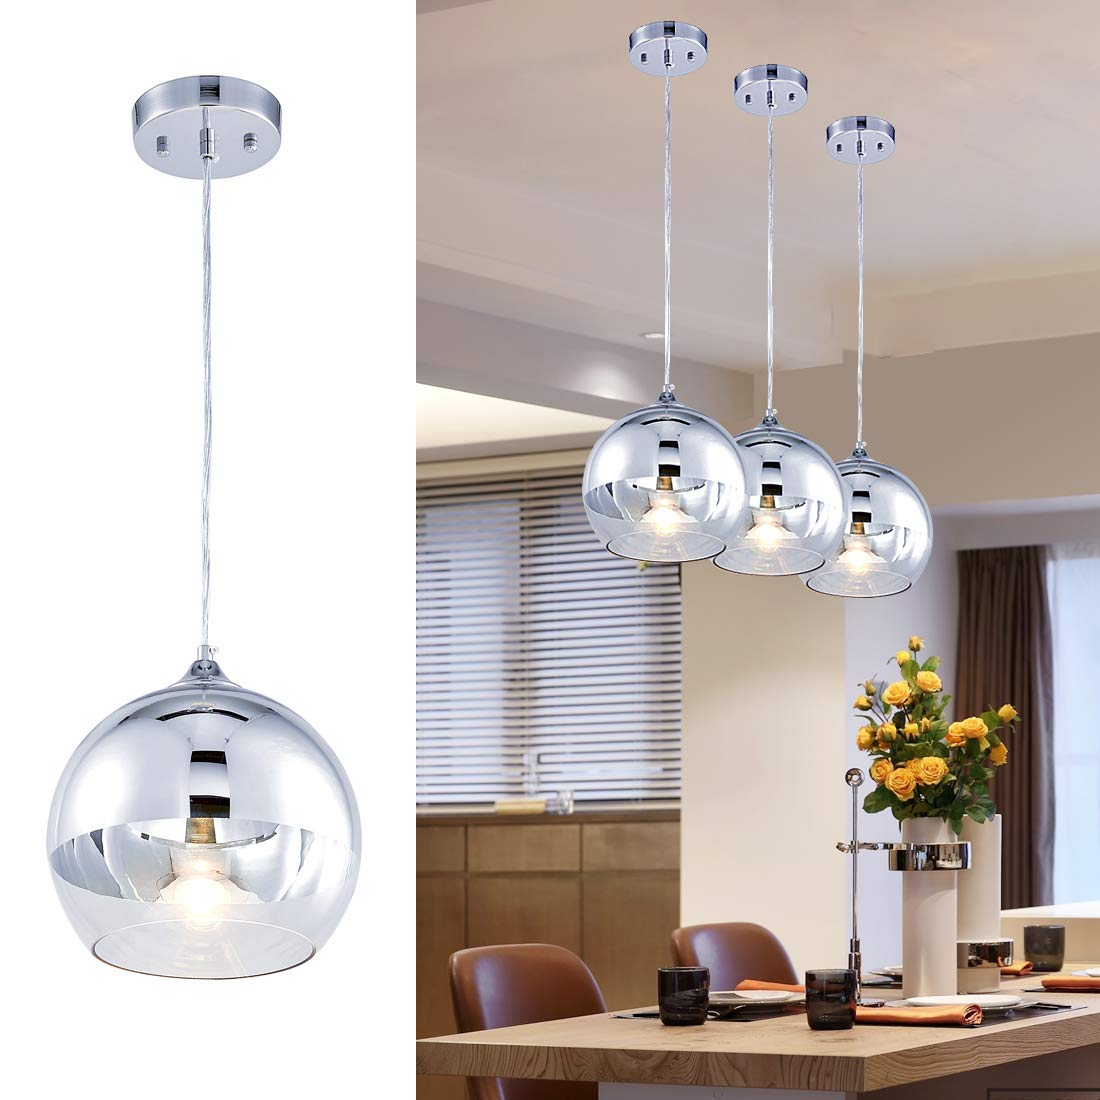 Tzoe globe pendant light 9 inches glass pendant lighthand blown glass hanging light polished chrome finishadjustable mirror ball pendant